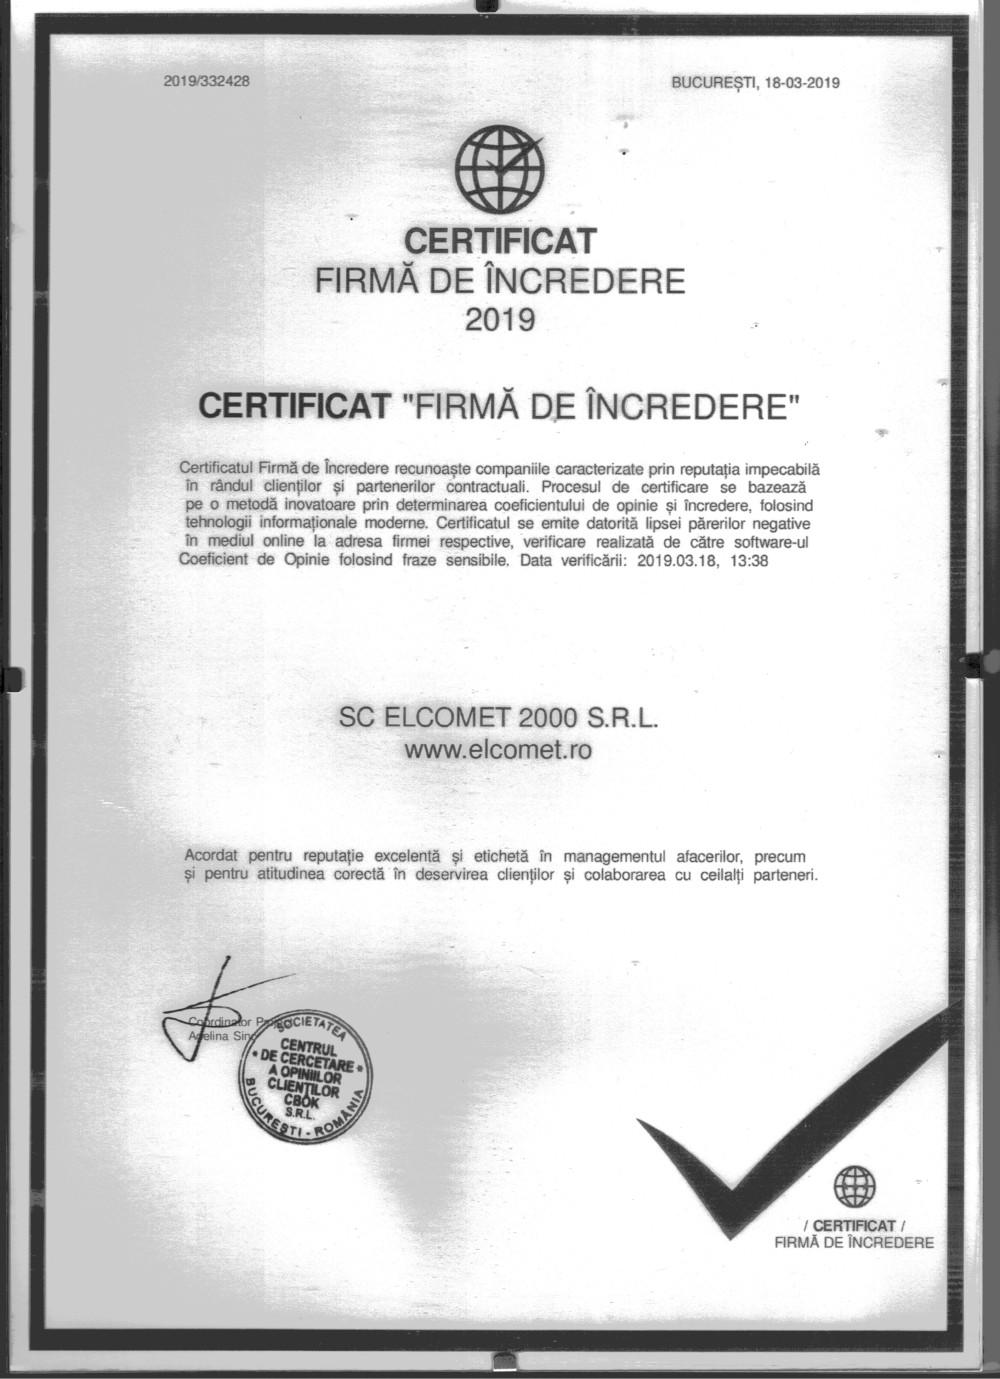 Certificat Firma Incredere 2019